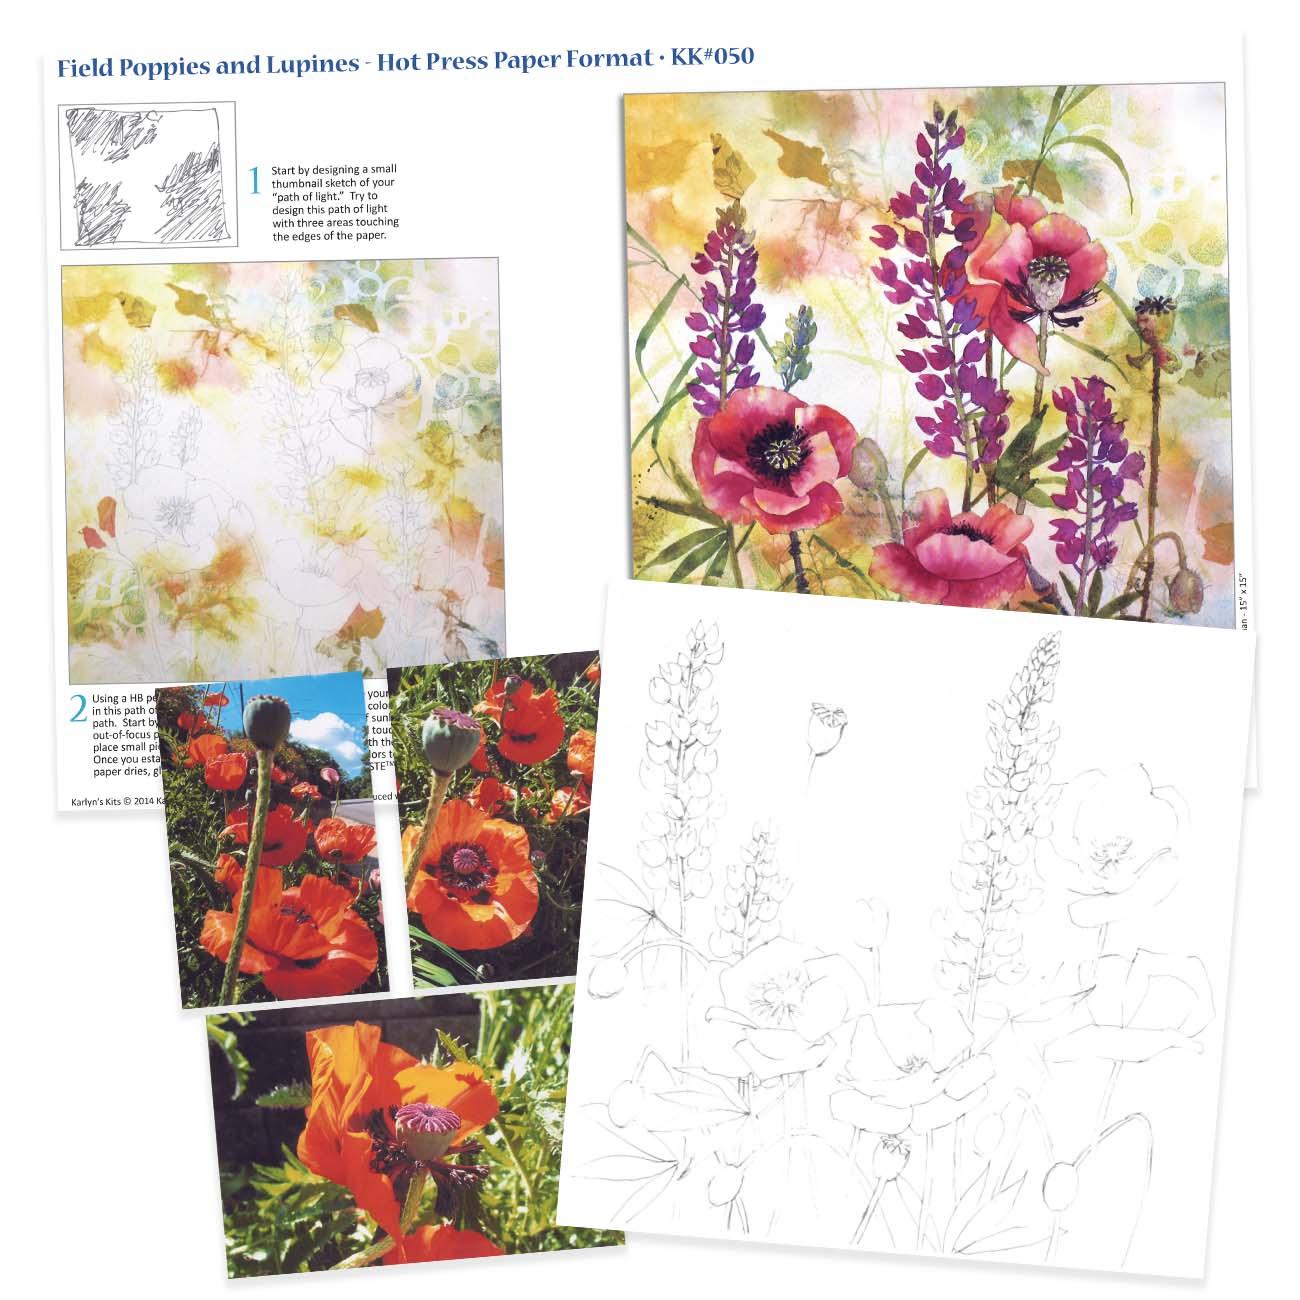 KK050 Field Poppies & Lupines on Hot Press Paper